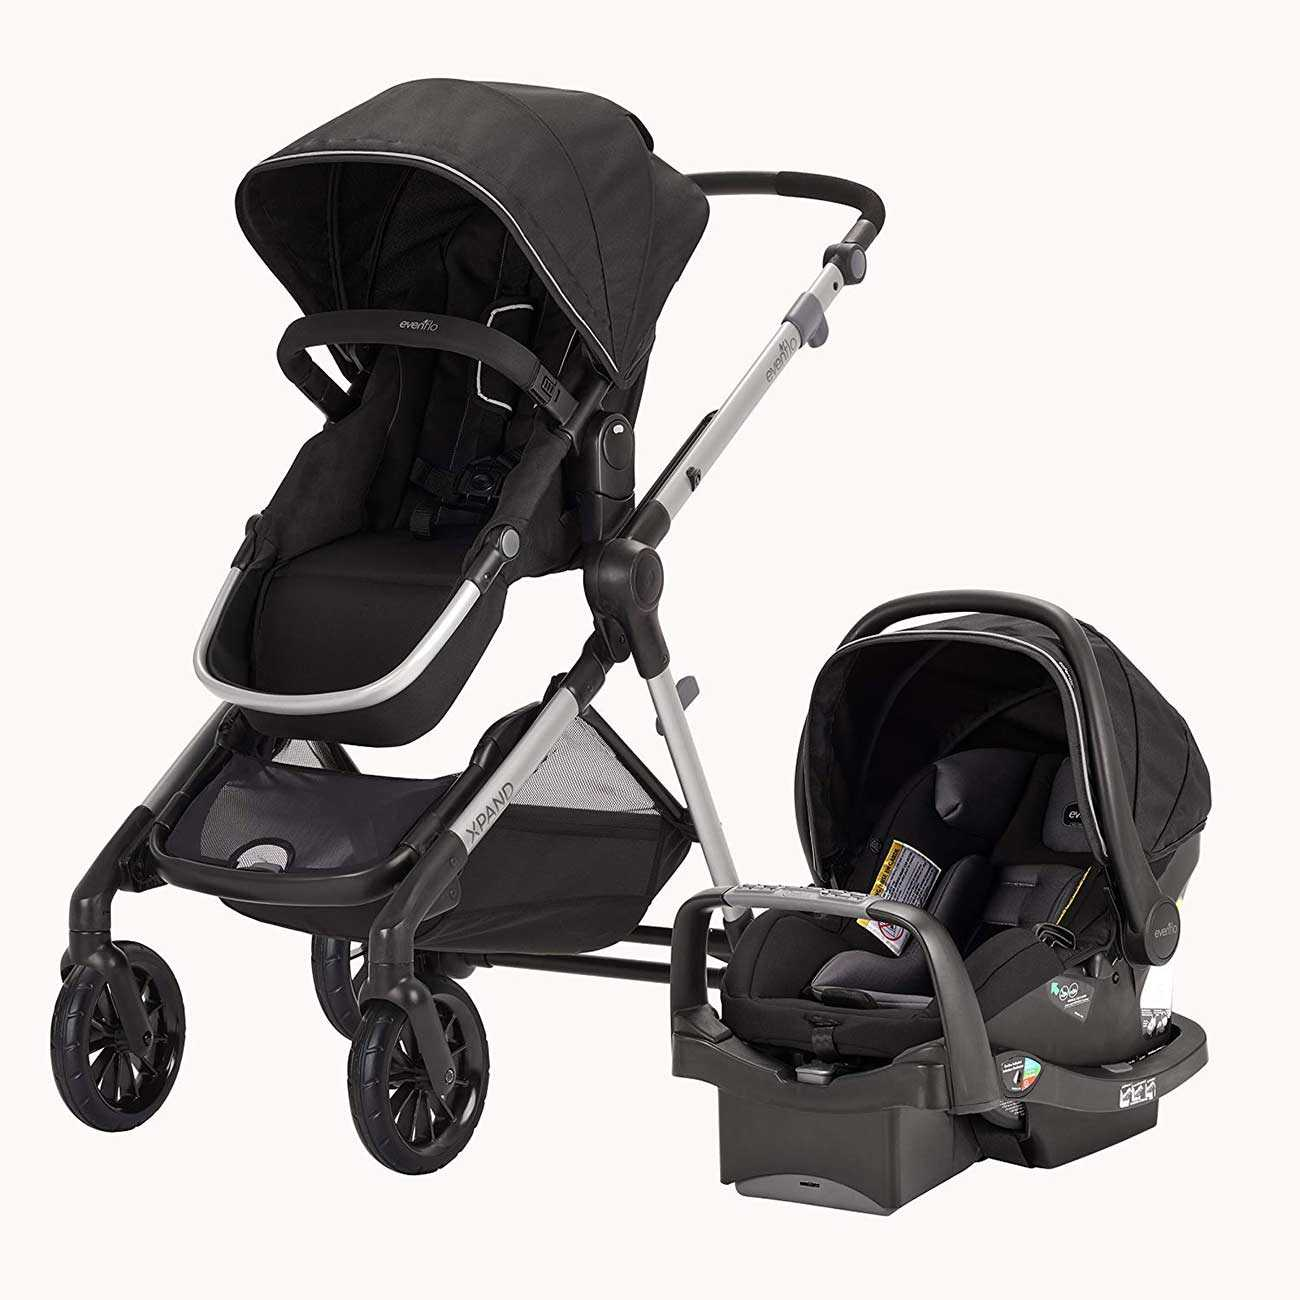 Perlengkapan bayi multifungsi, stroller sekaligus car seat, via babybargains.com